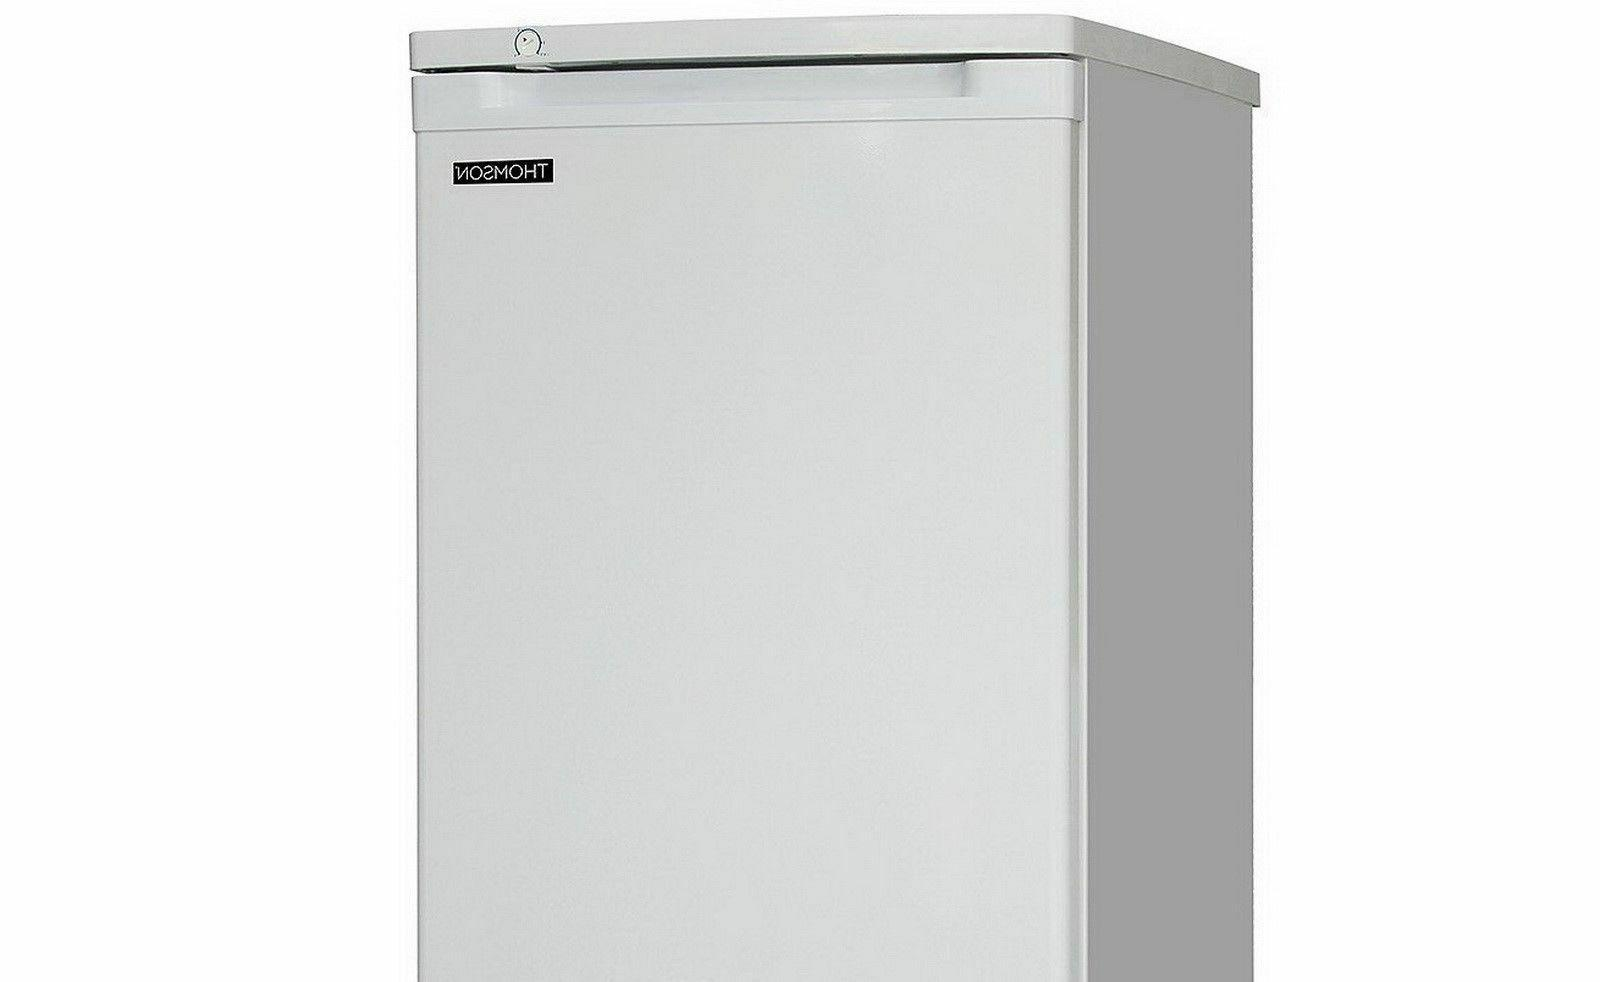 Upright Freezer 6.5 ft.